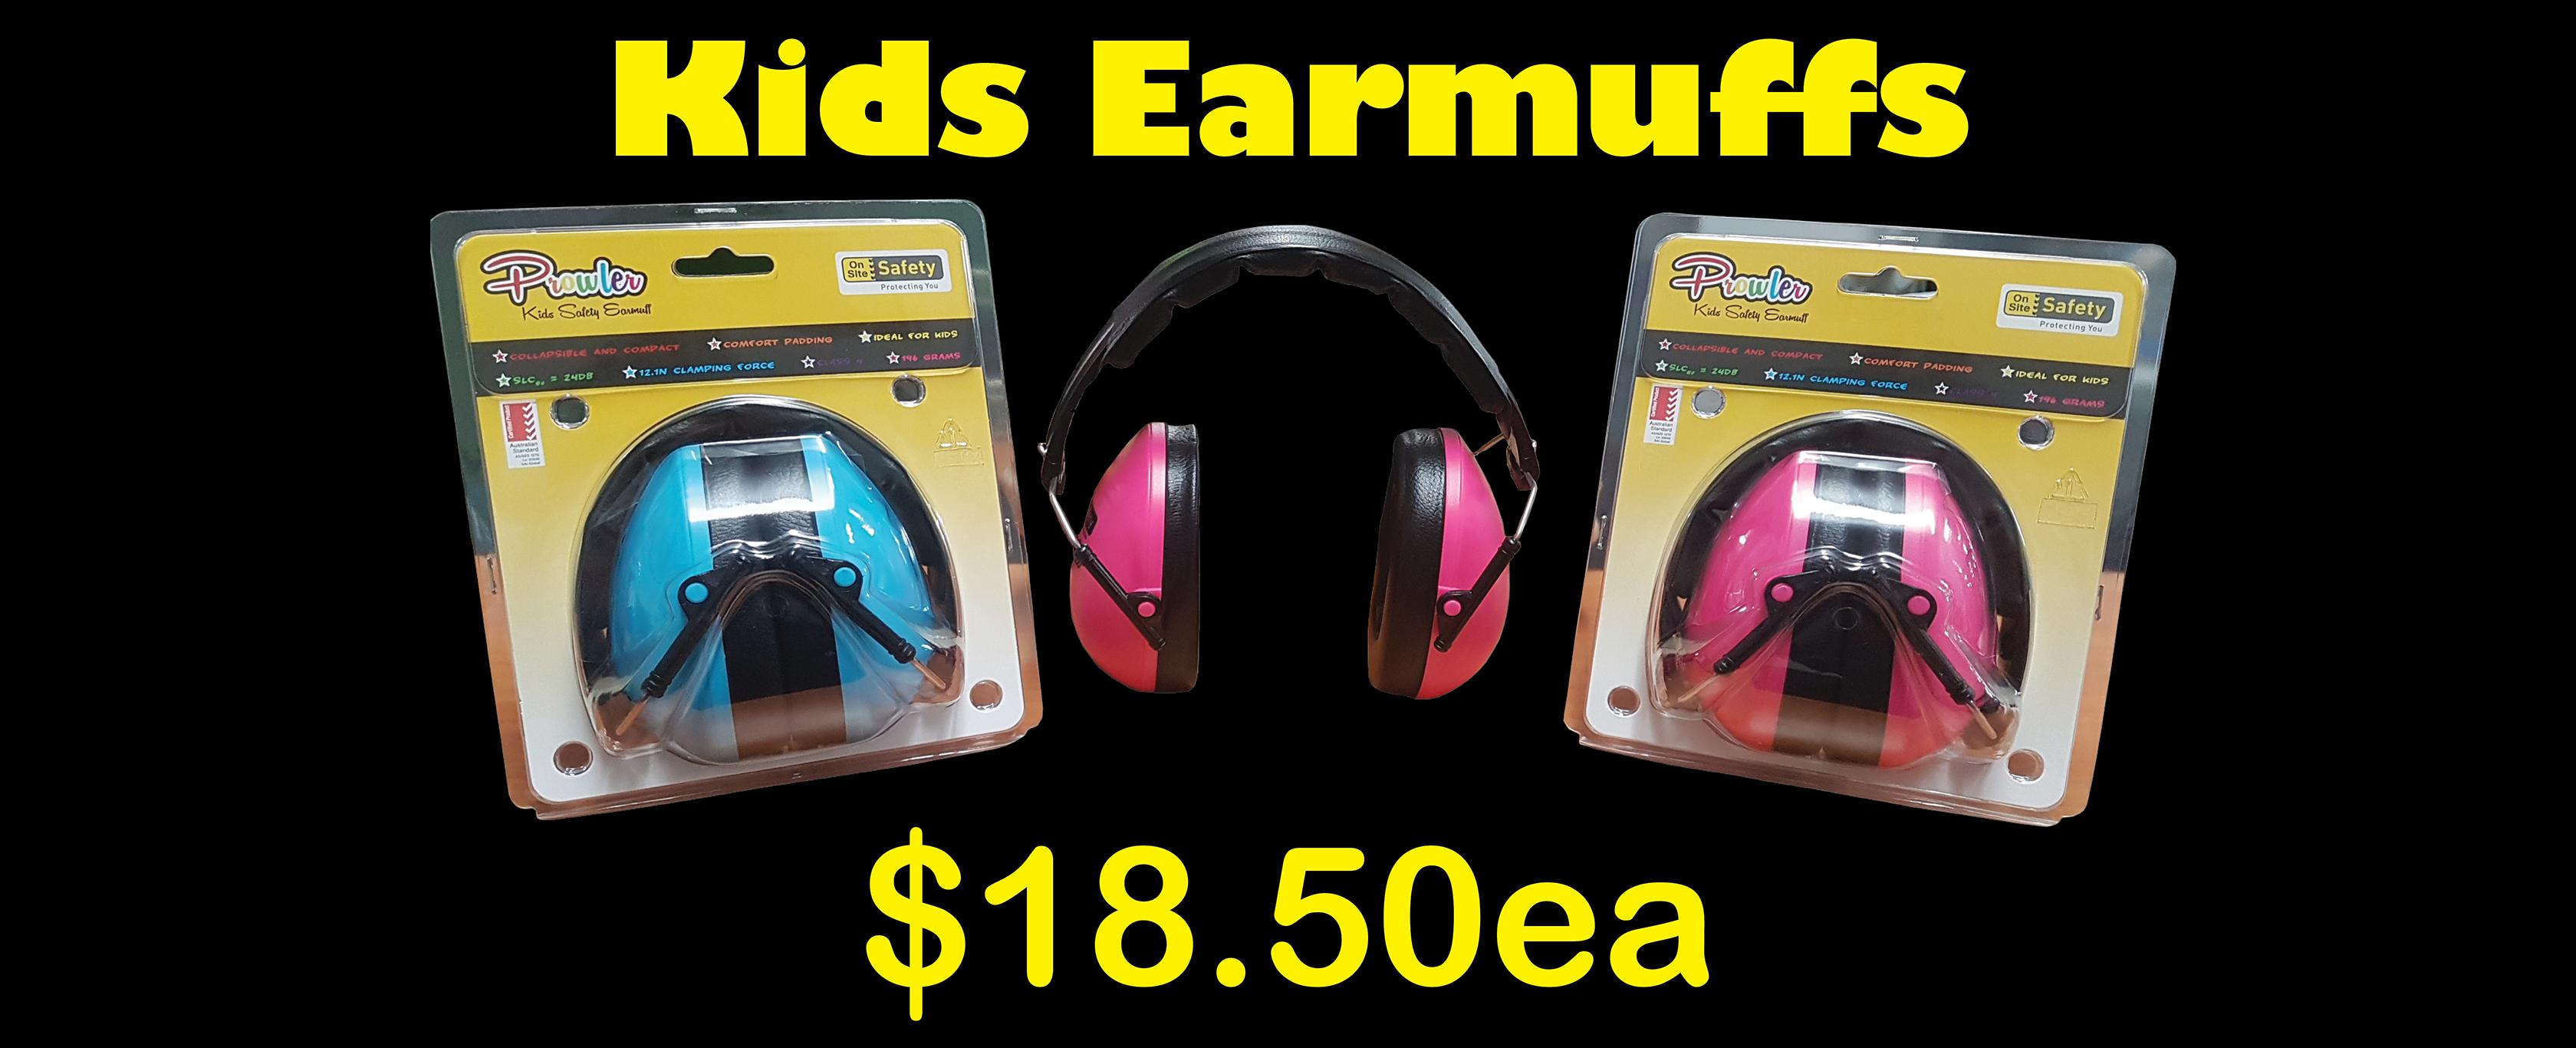 Kids-earmuffs